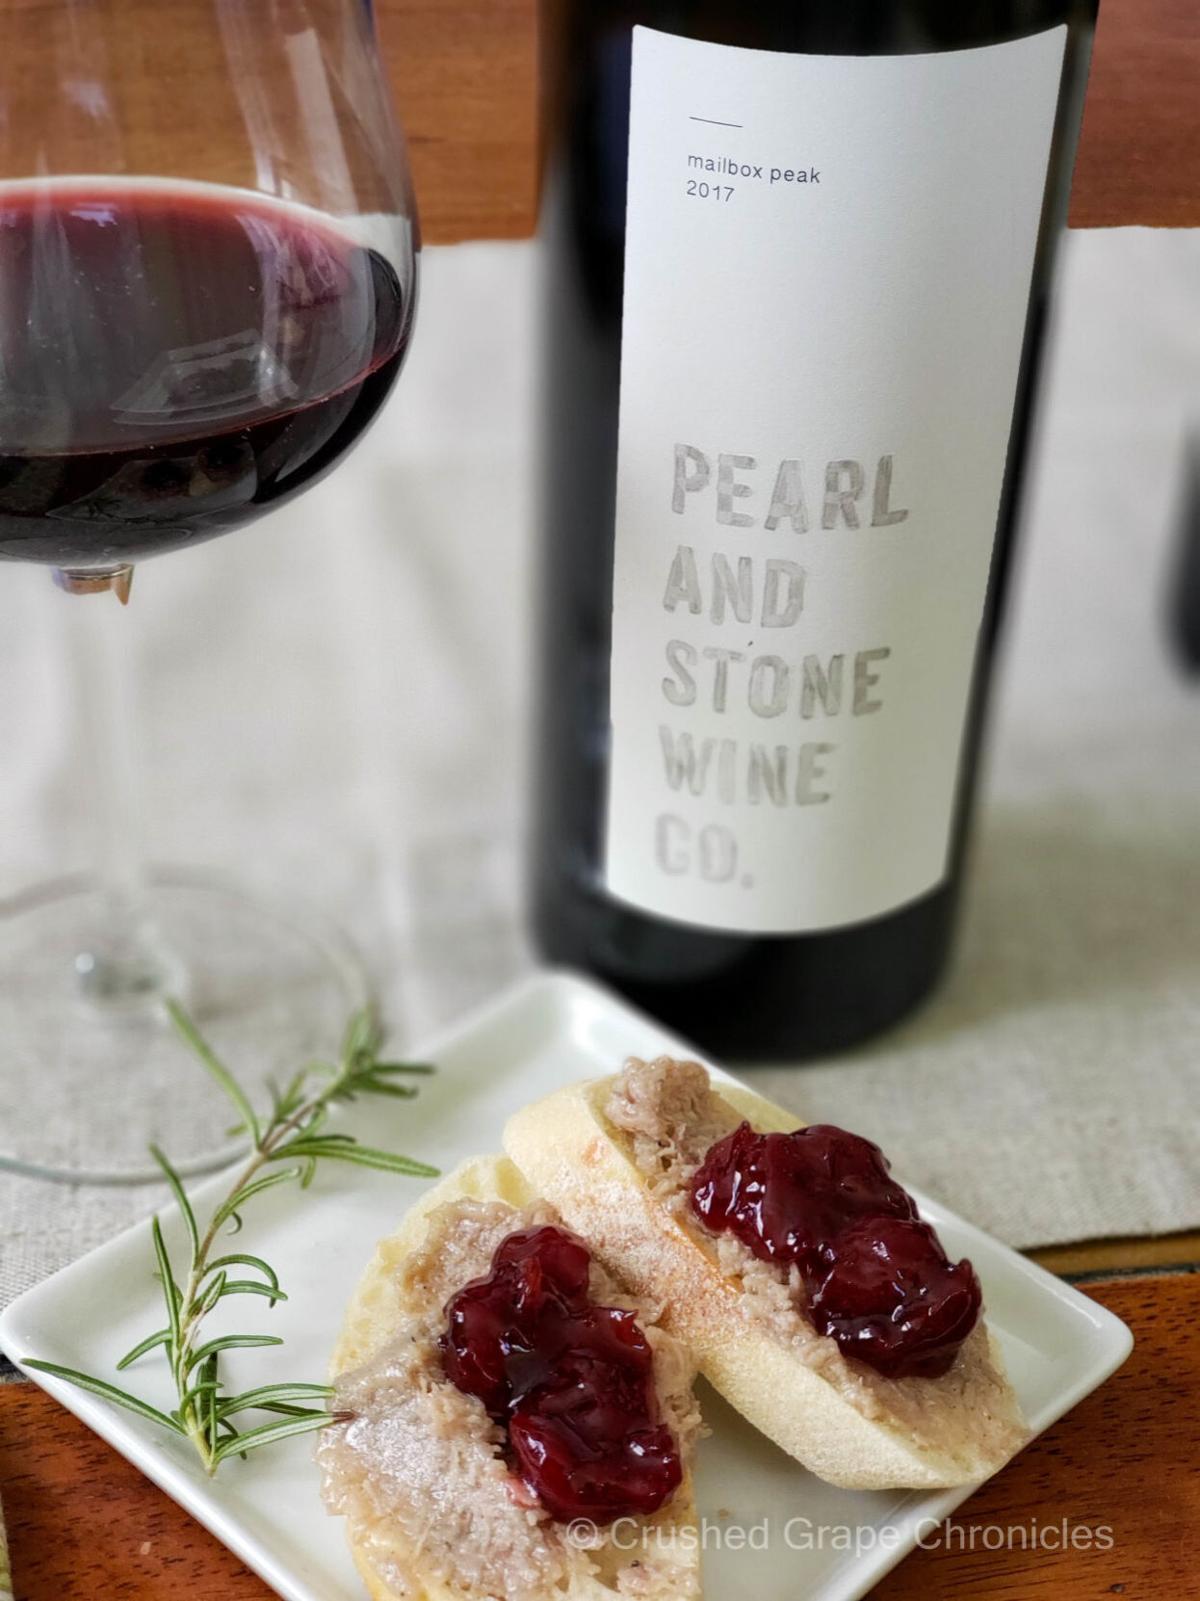 wine - Pearl & Stone 2017 Mailbox Peak with Duck Rillettes and Morello Cherry preserves.jpg